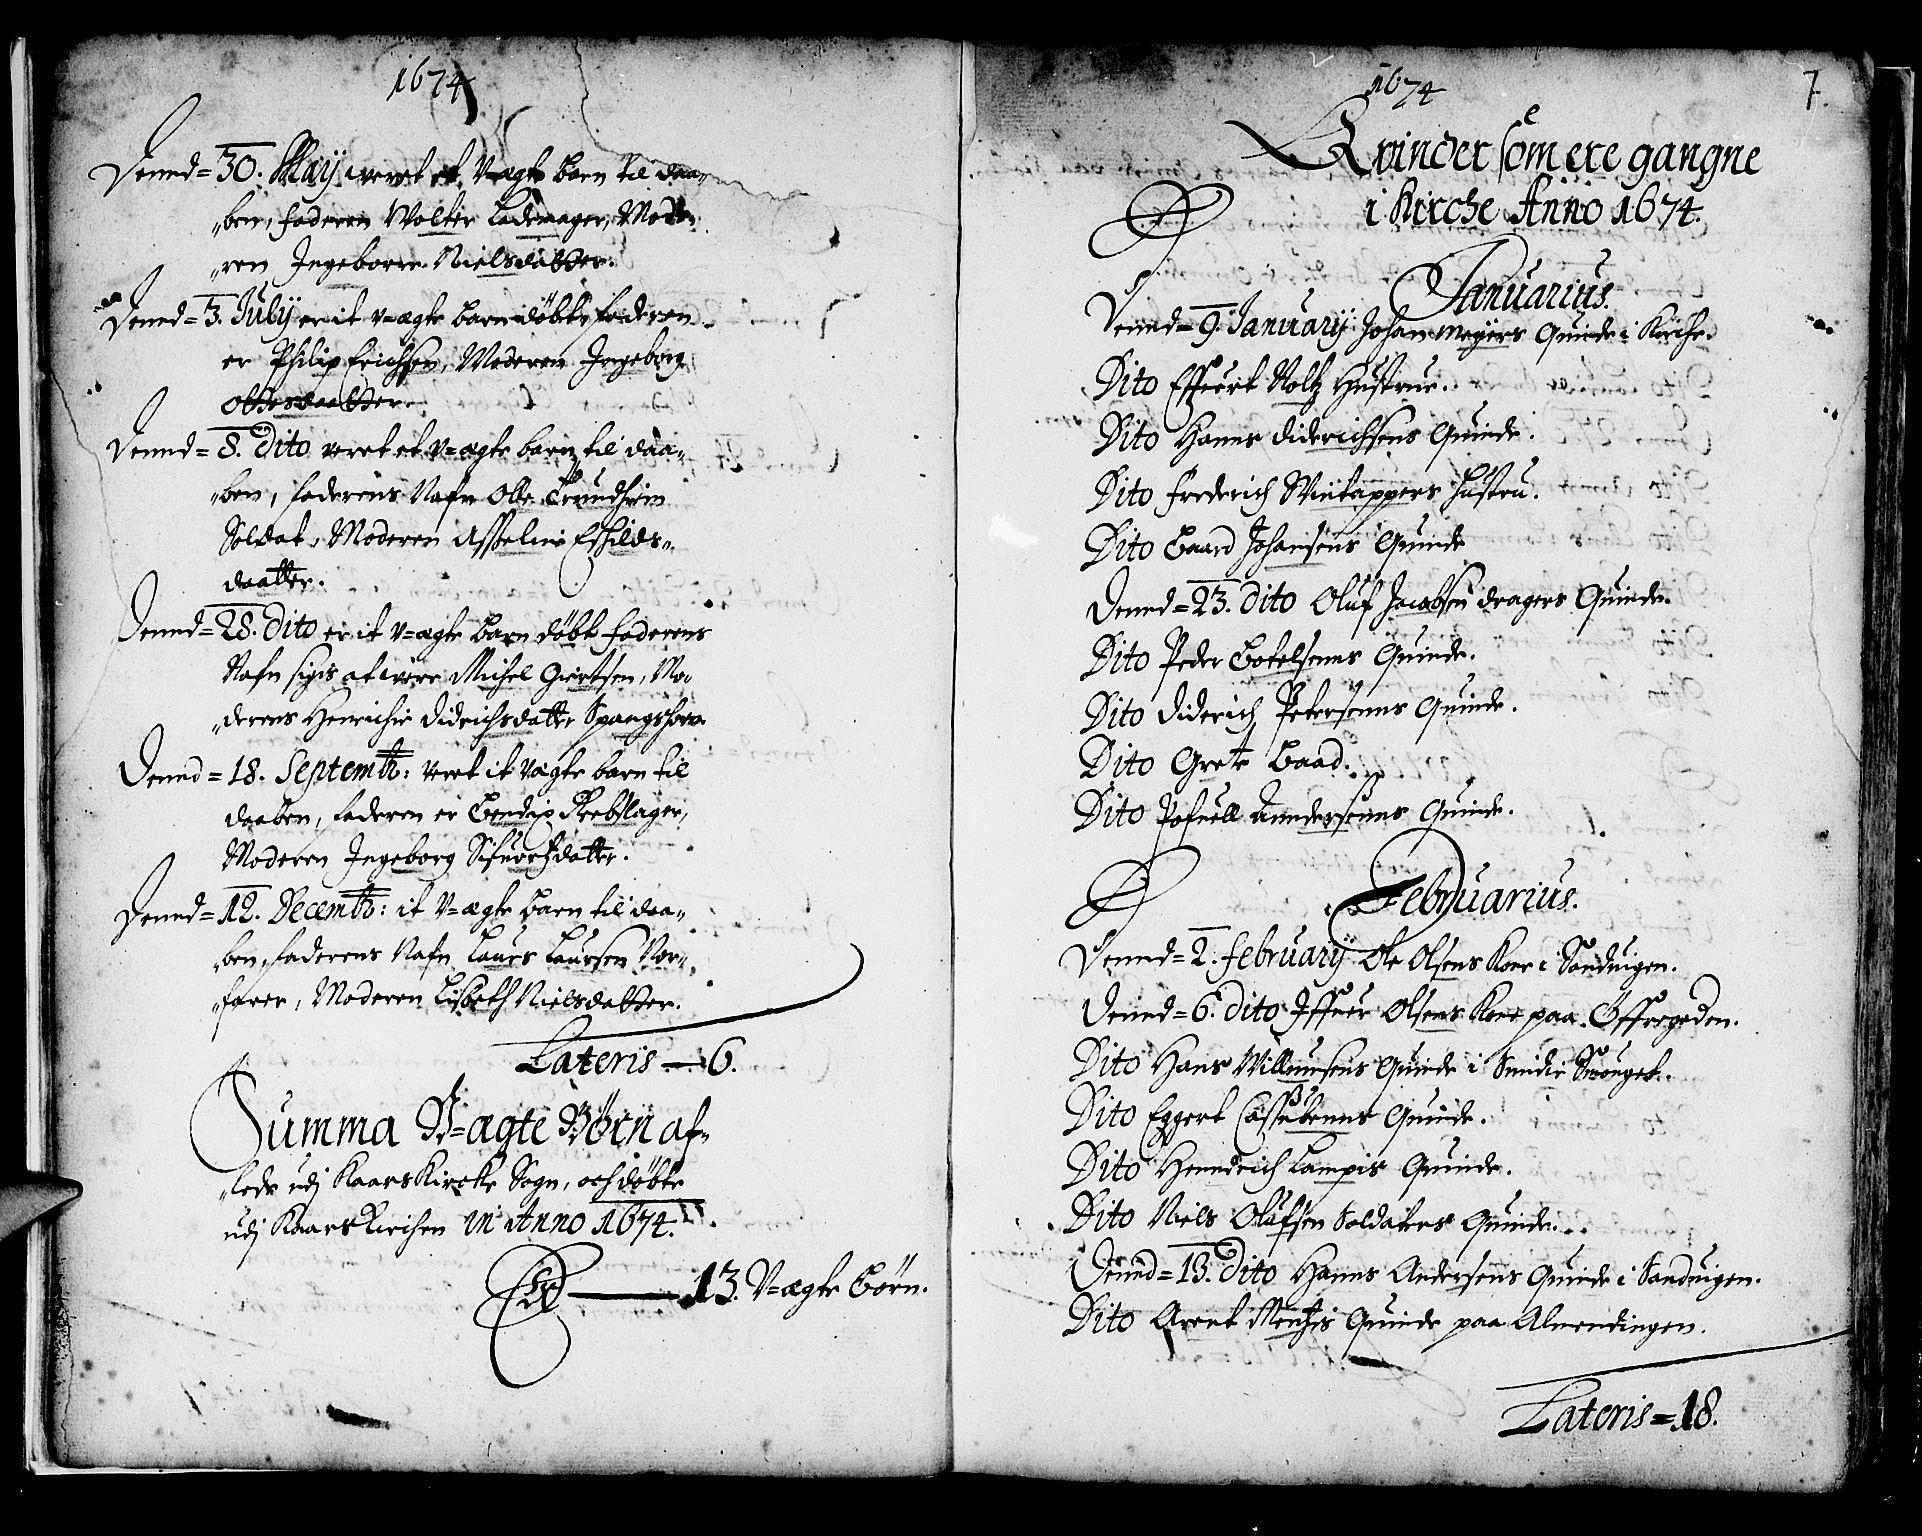 SAB, Korskirken Sokneprestembete, H/Haa/L0001: Ministerialbok nr. A 1, 1674-1688, s. 7